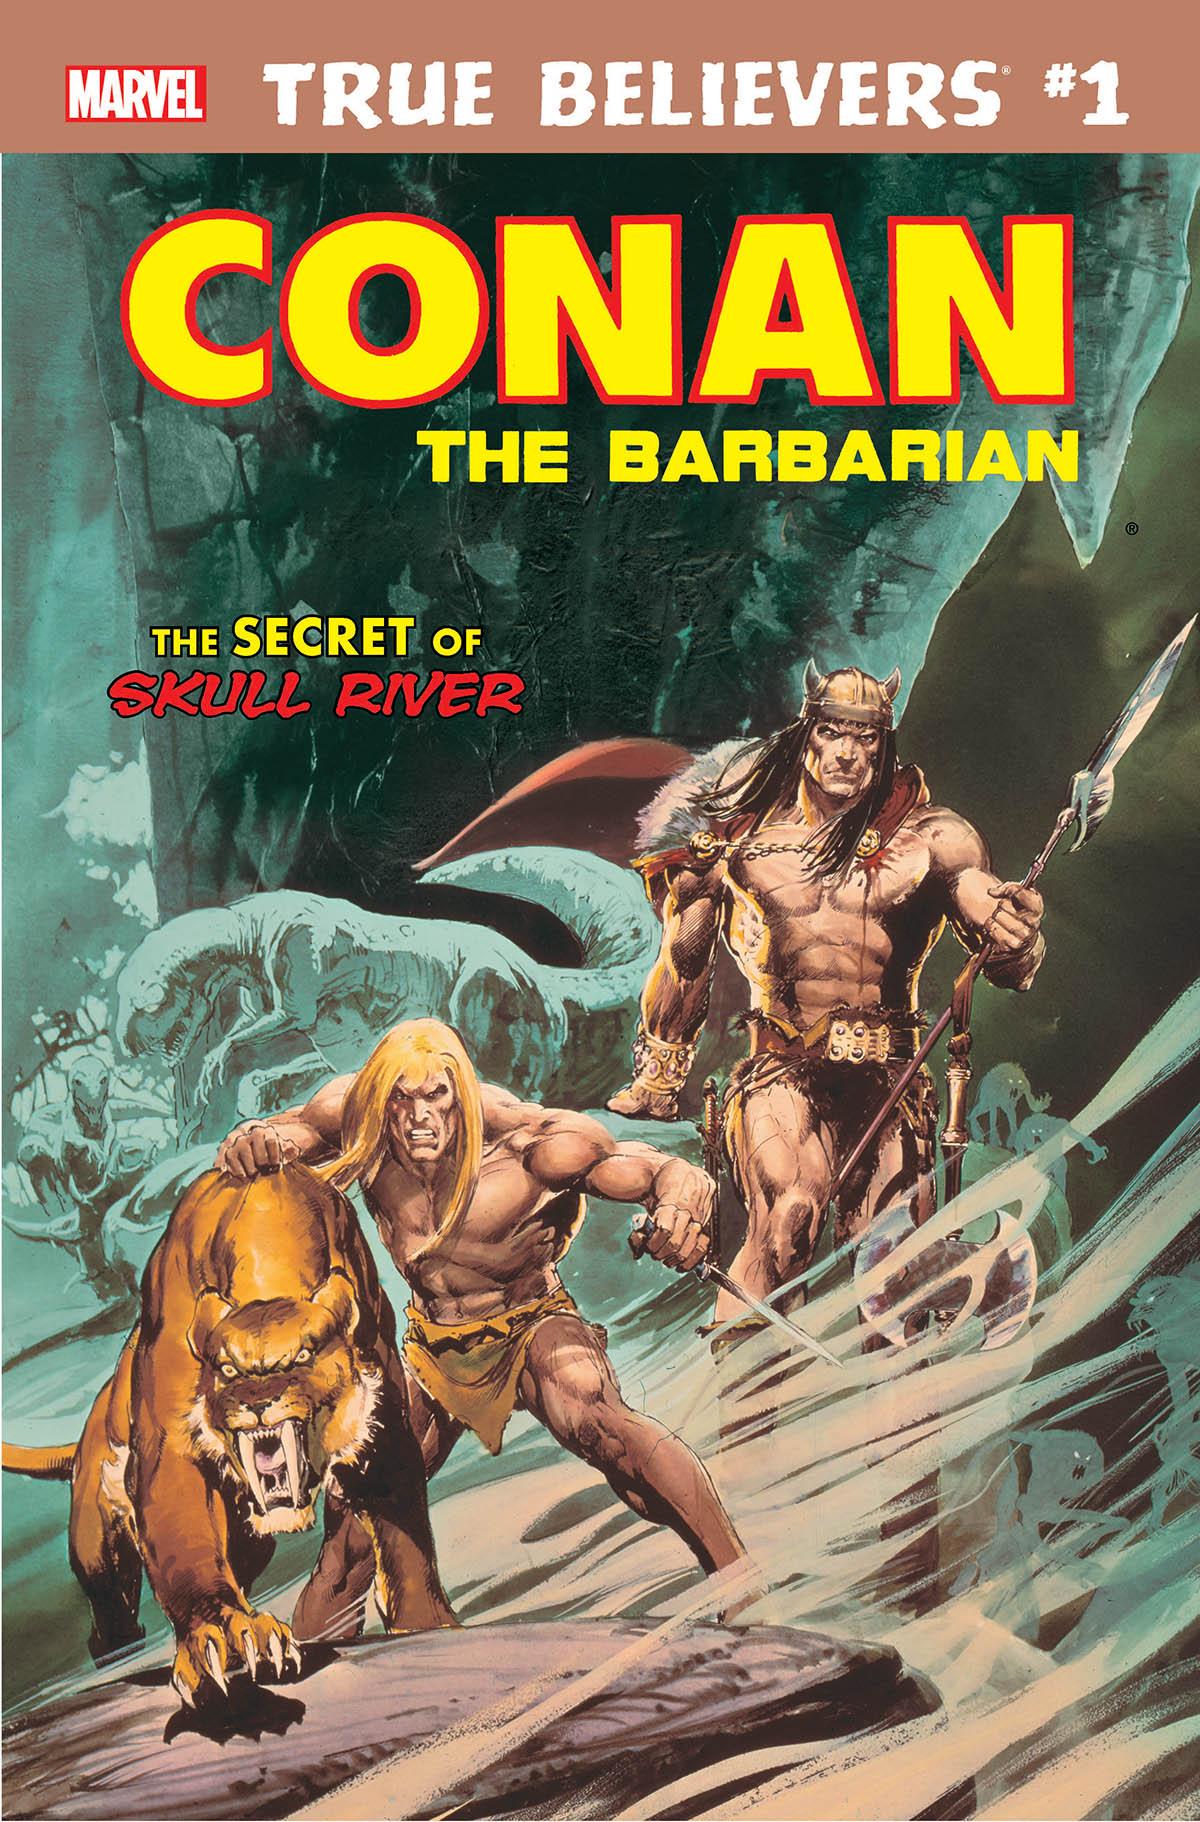 True Believers: Conan - The Secret of Skull River Vol 1 1